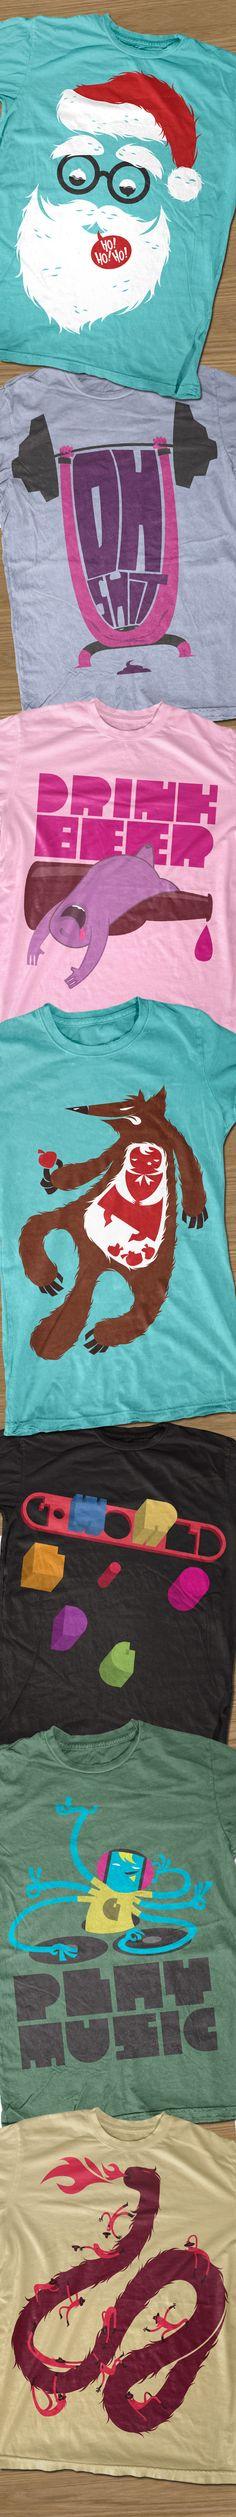 G-world t-shirt designs number two by Goktug Ozge, via Behance